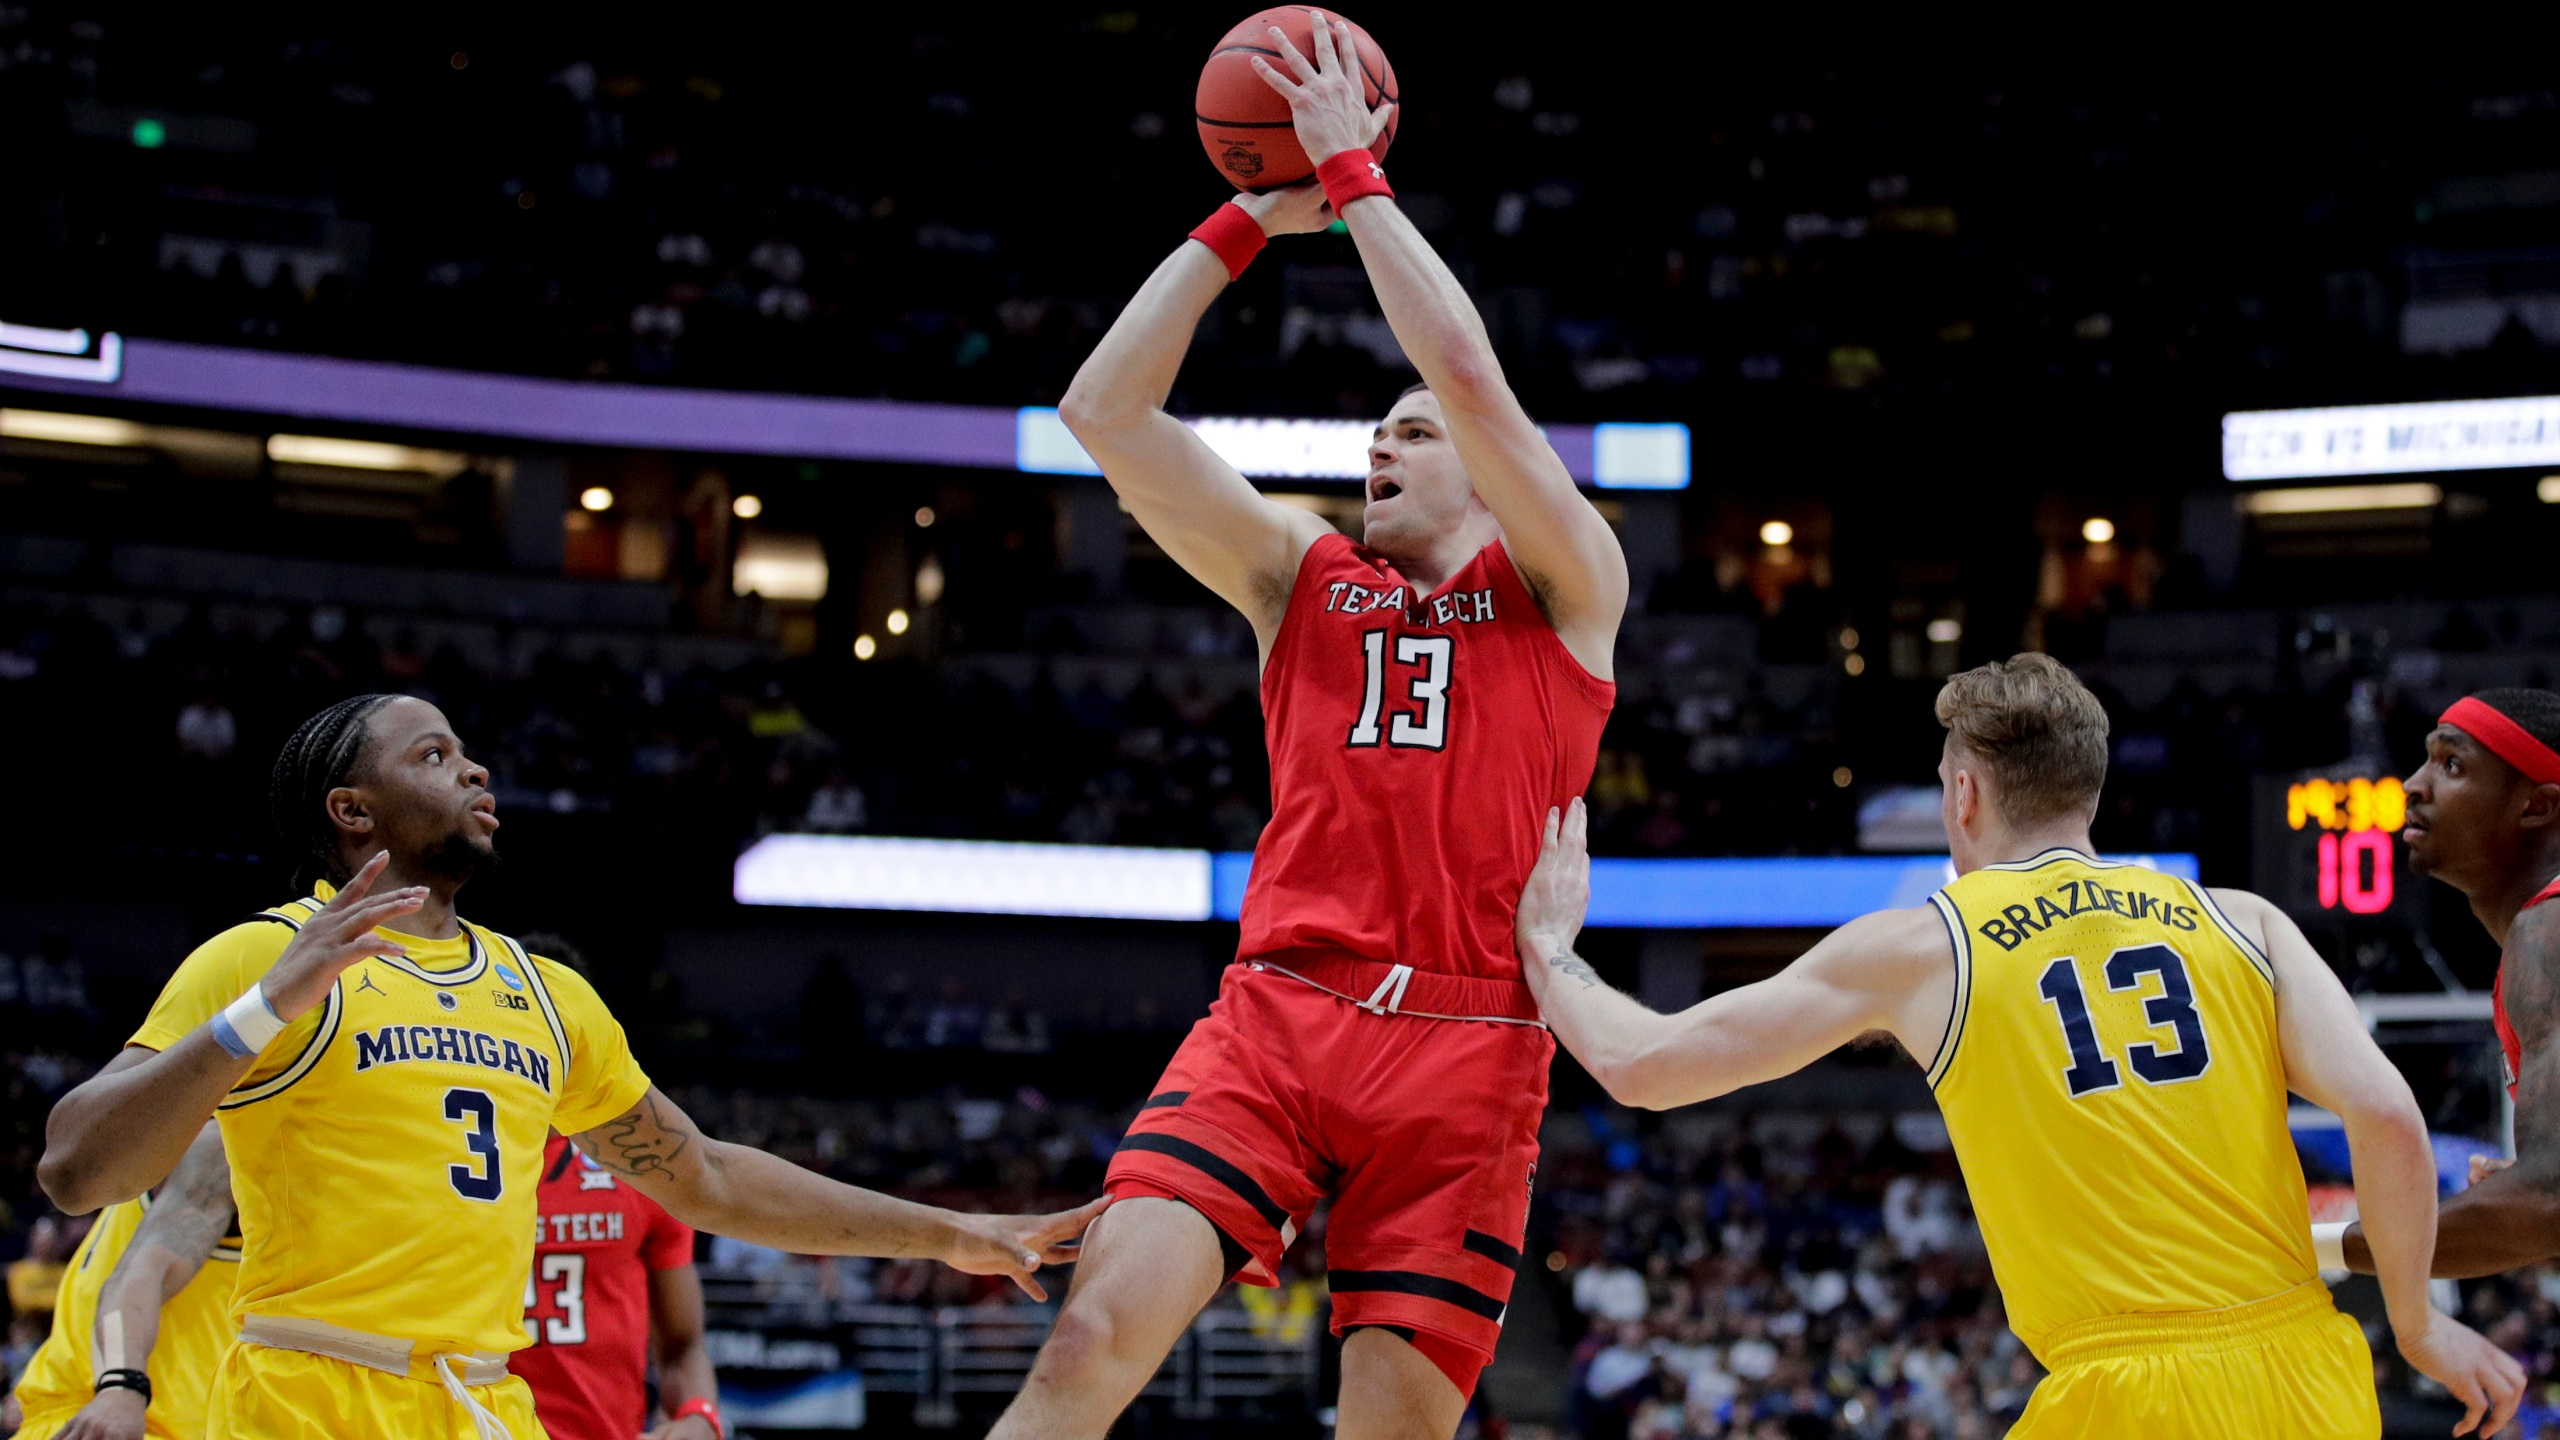 NCAA_Texas_Tech_Michigan_Basketball_48458-159532.jpg38000383